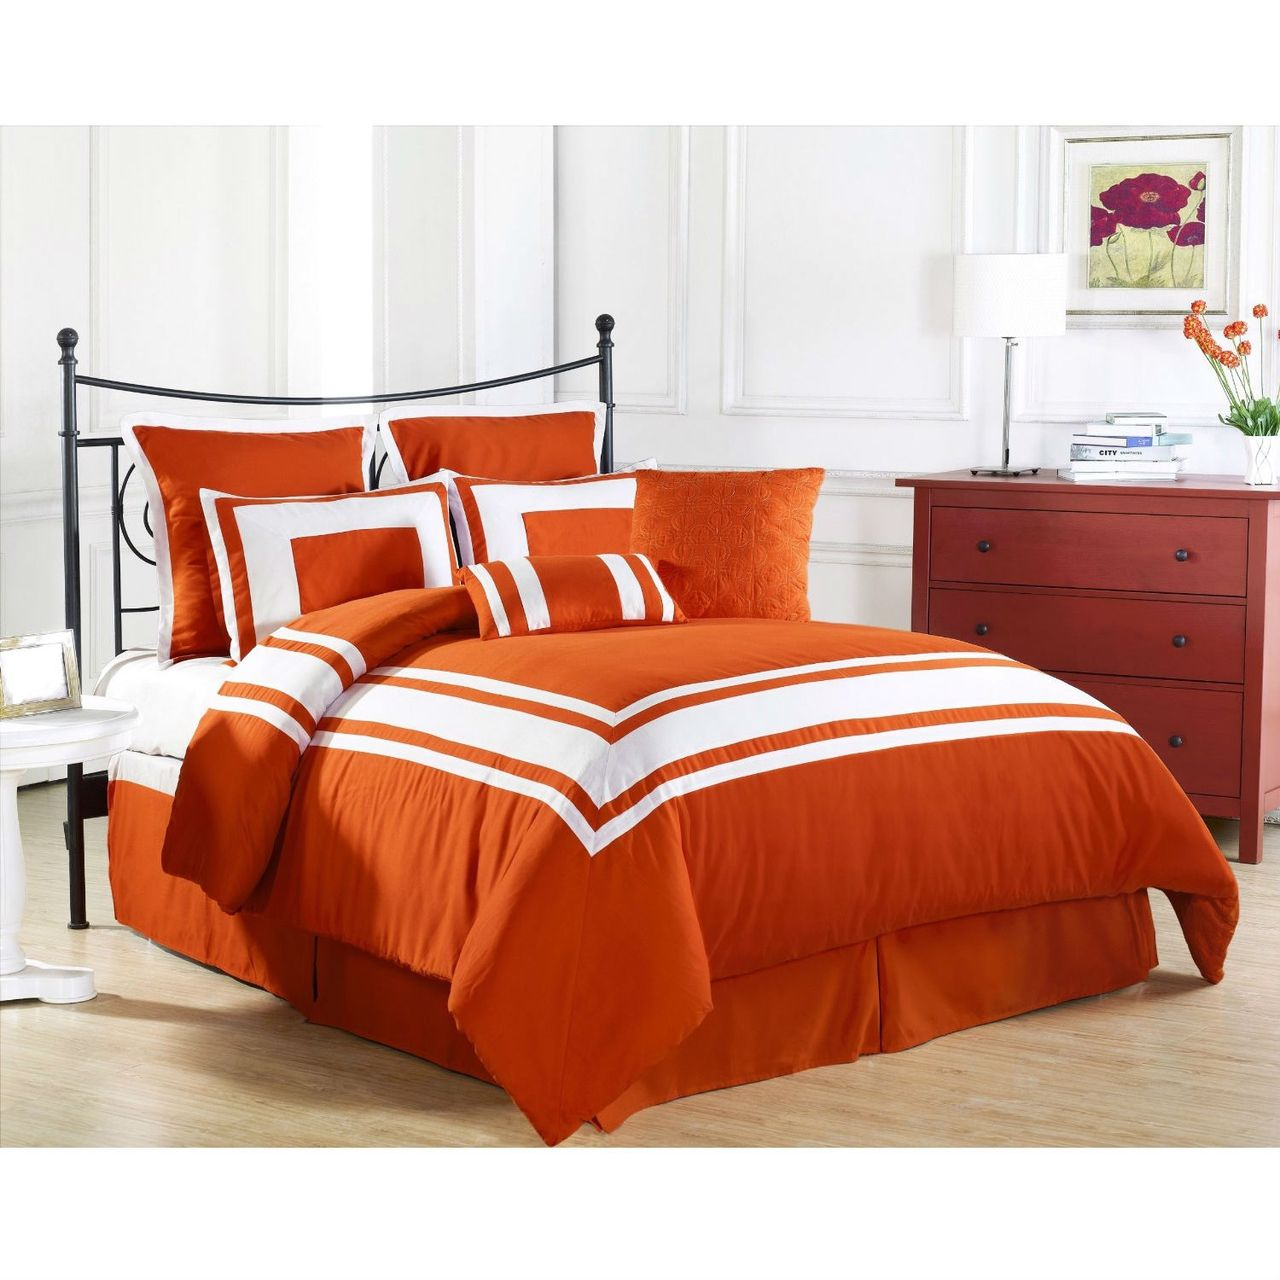 Queen Size 8 Piece Bed Bag Comforter Set In Tangerine Orange White